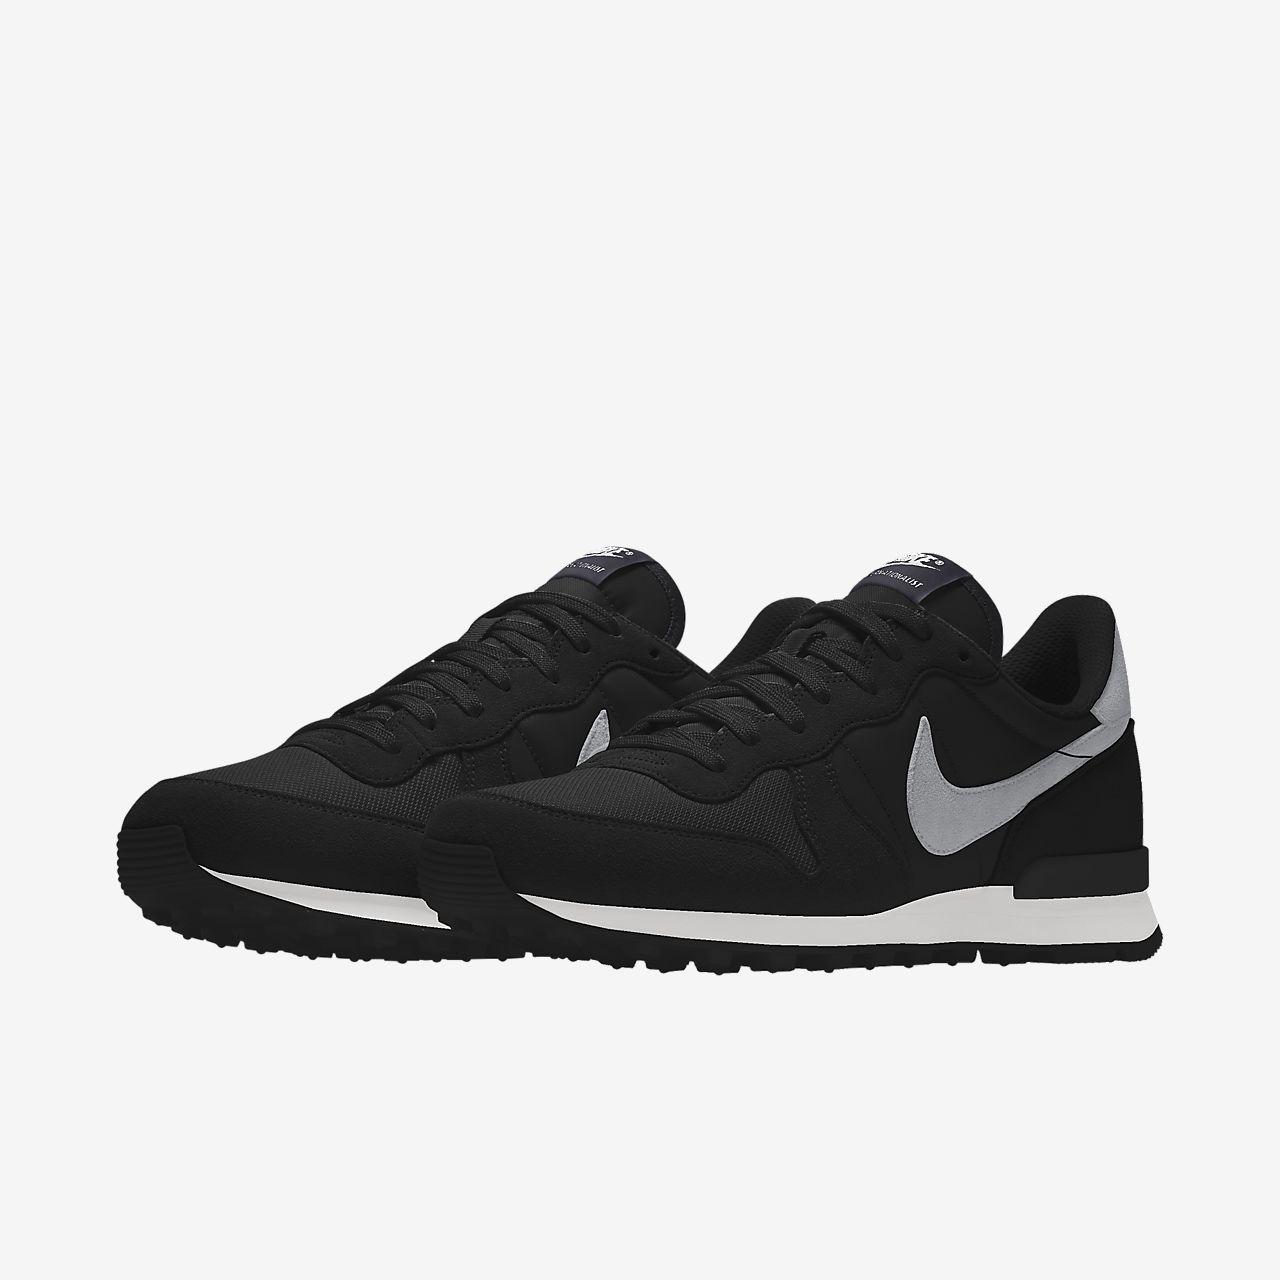 Nike Internationalist By You Custom Men's Shoe | Nike red